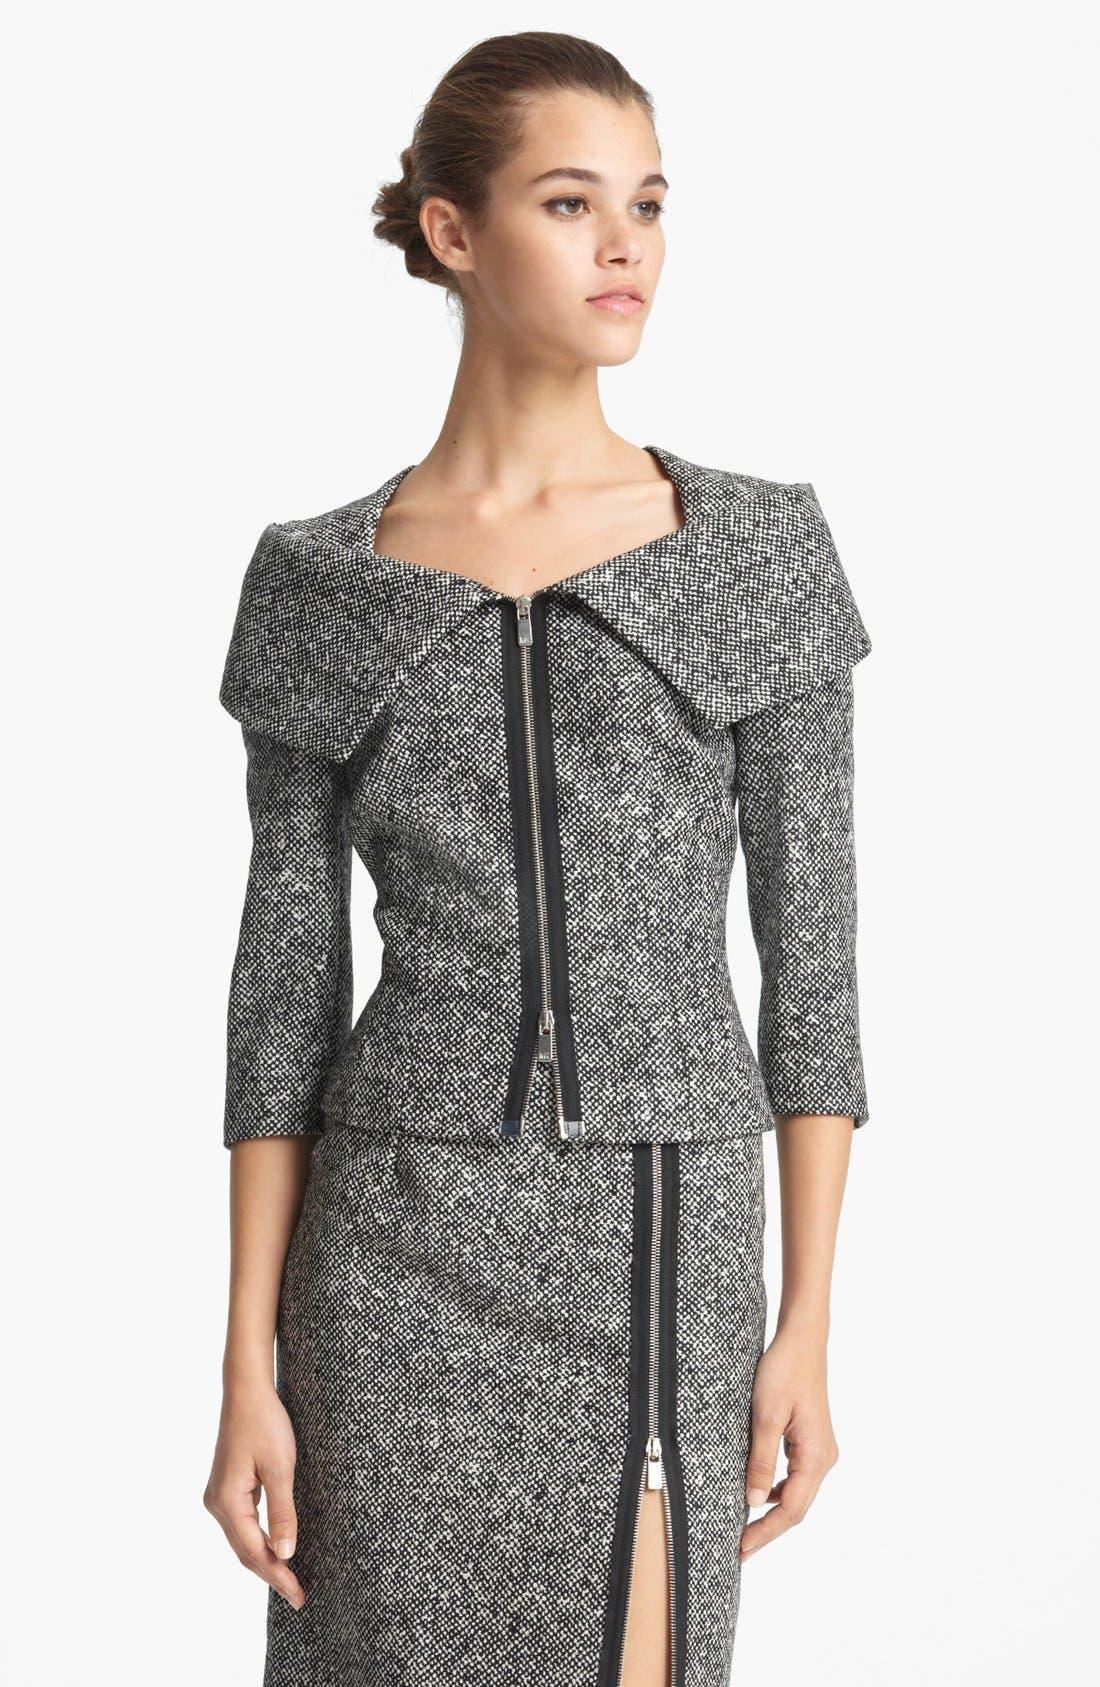 Alternate Image 1 Selected - Michael Kors Origami Collar Tweed Jacket